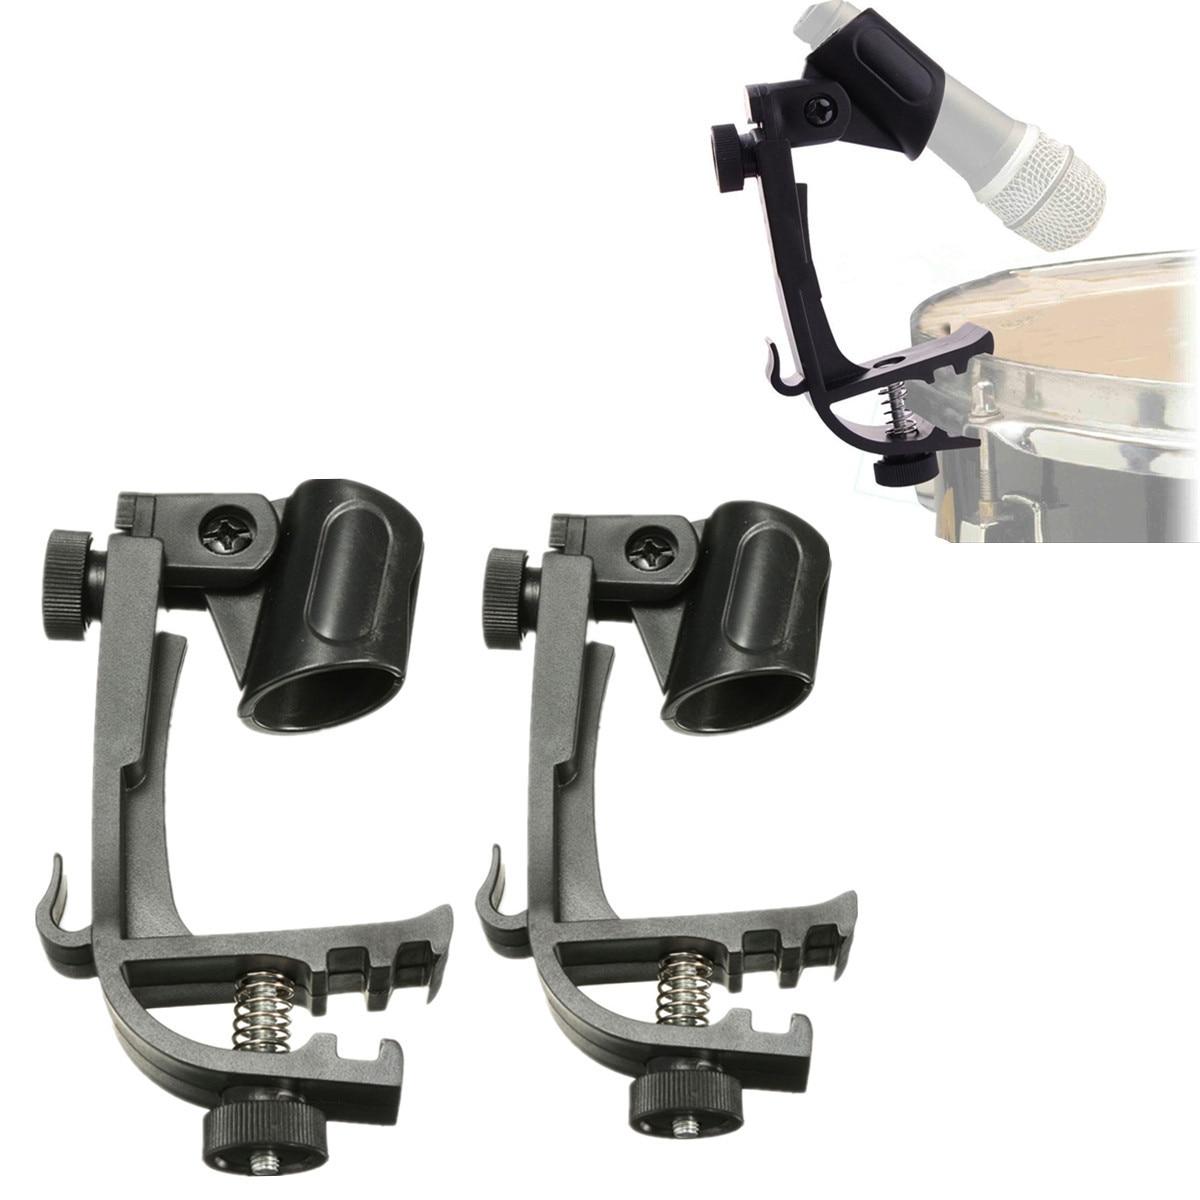 Zebra 2 pcs/Lot Plastic+Metal Microphone Adjustable Stage Drum Clips Mic Rim Snare Mount Clamp Holder Groove Gear Studio Stand